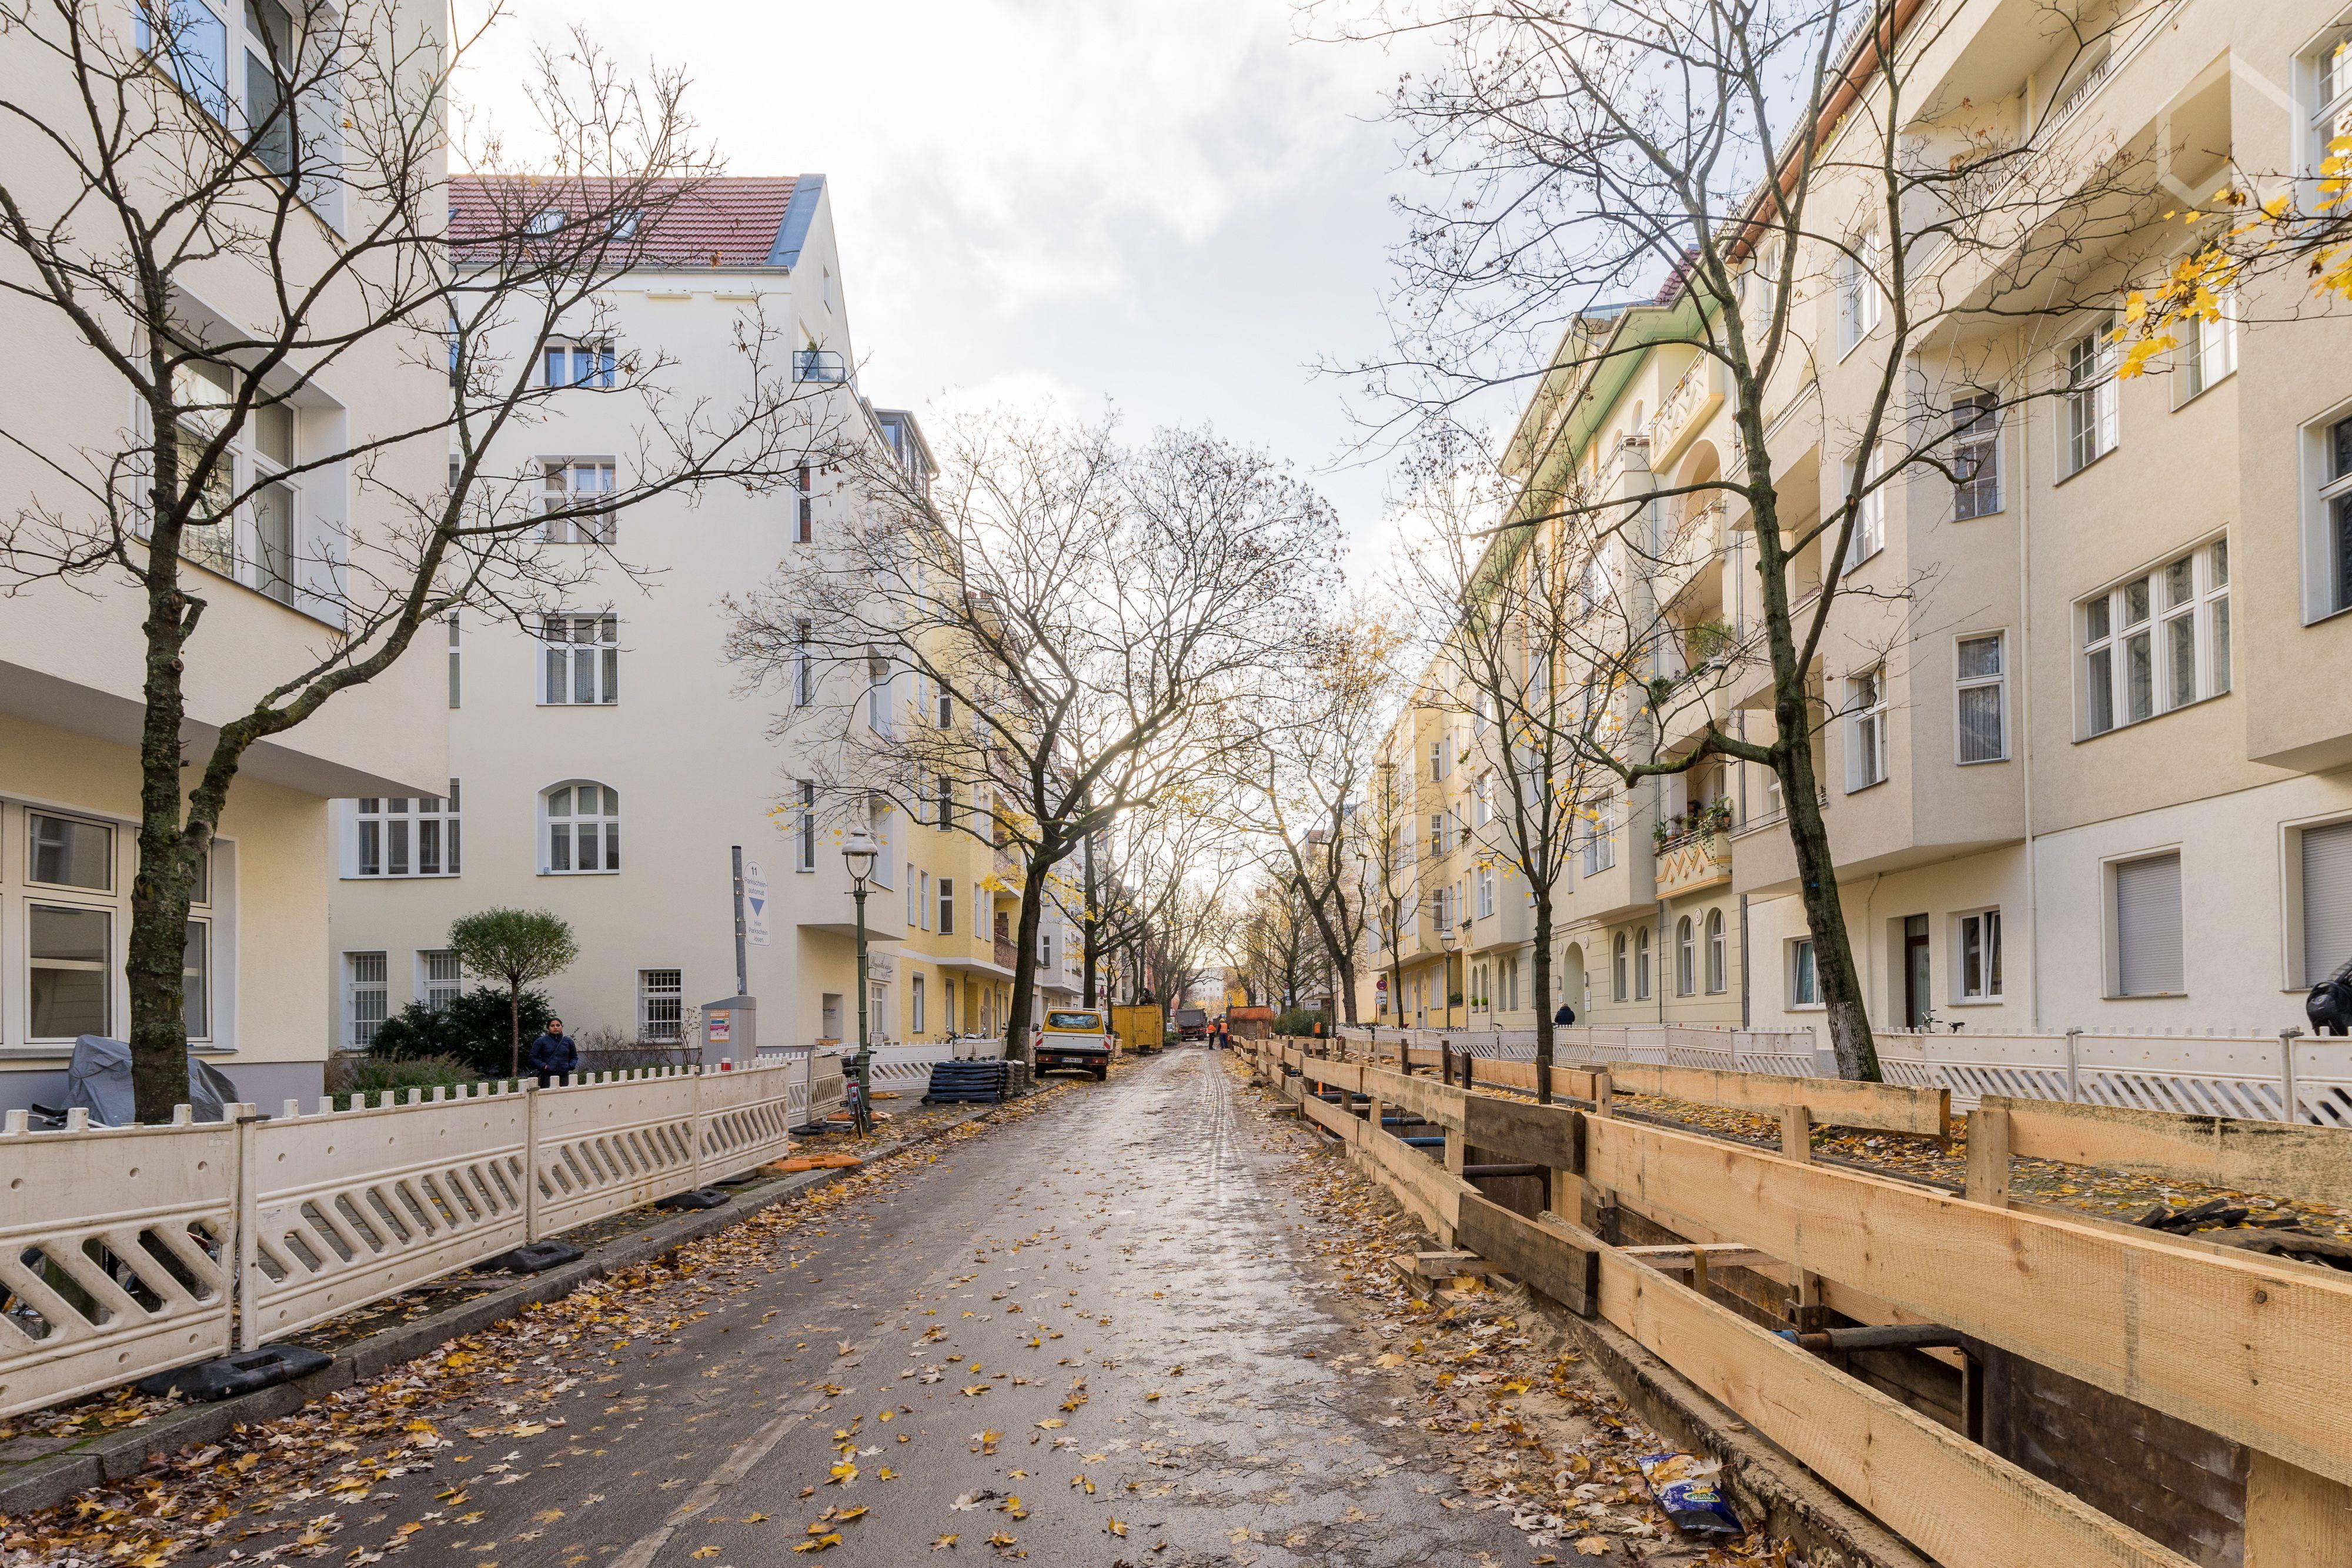 Gieselerstraße